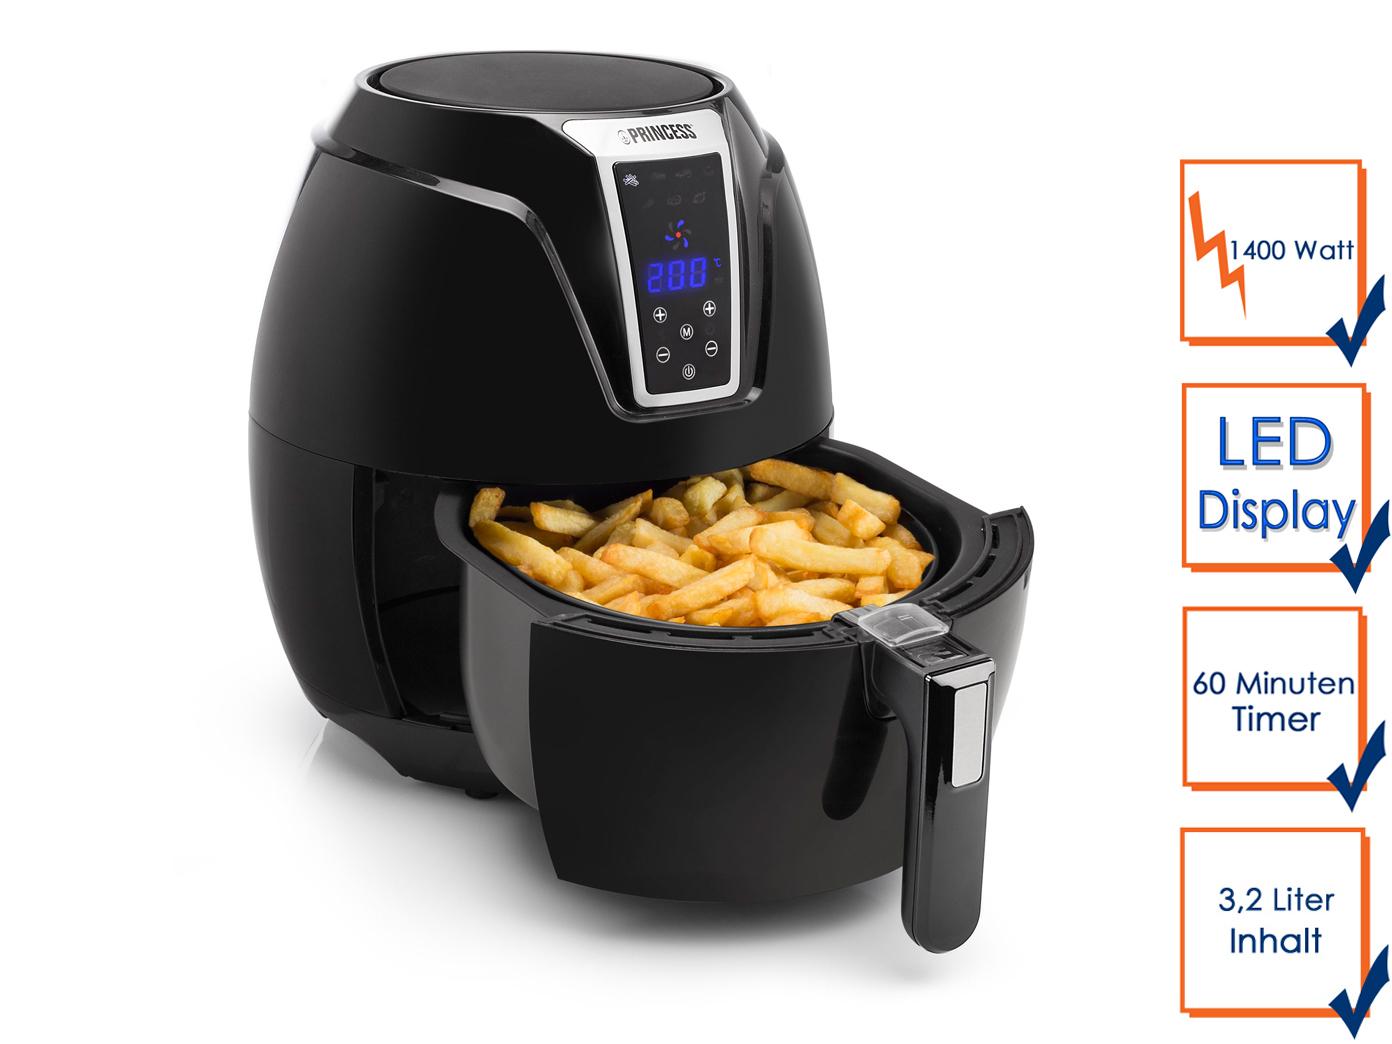 Kalorienarme Pommes Heißluftfritteusen Fritöse ohne Öl Grill TRISTAR Fettfreie